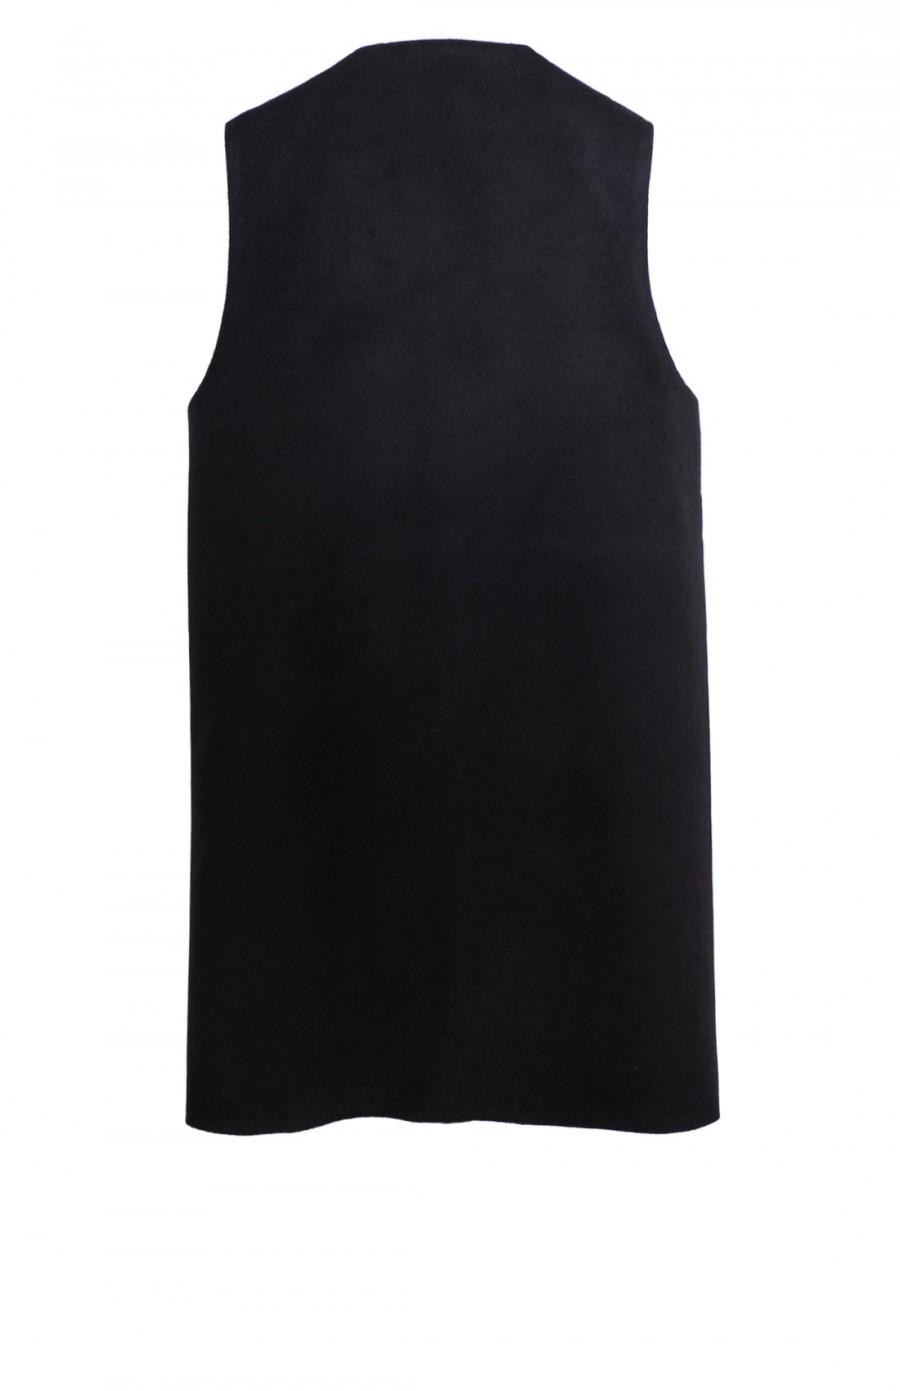 Cashmere Blend vest